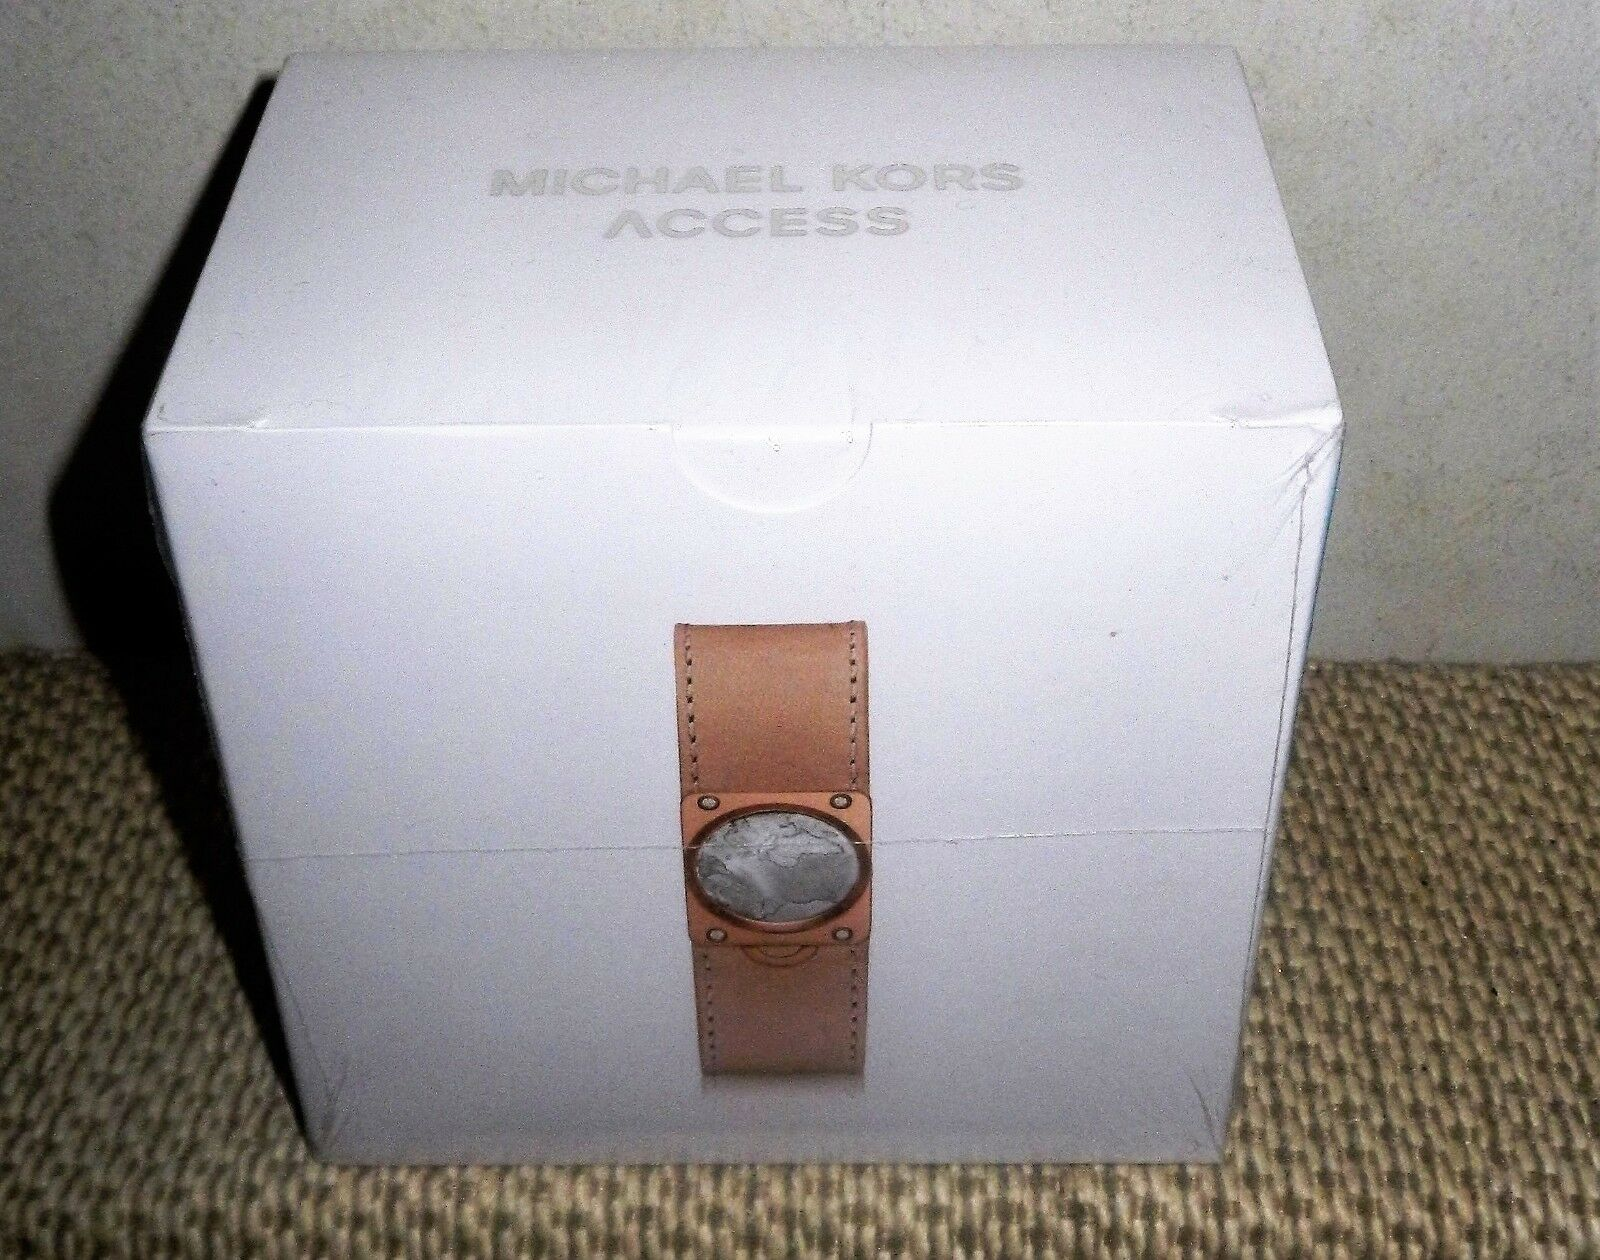 e4a24e910a6b Michael Kors Access